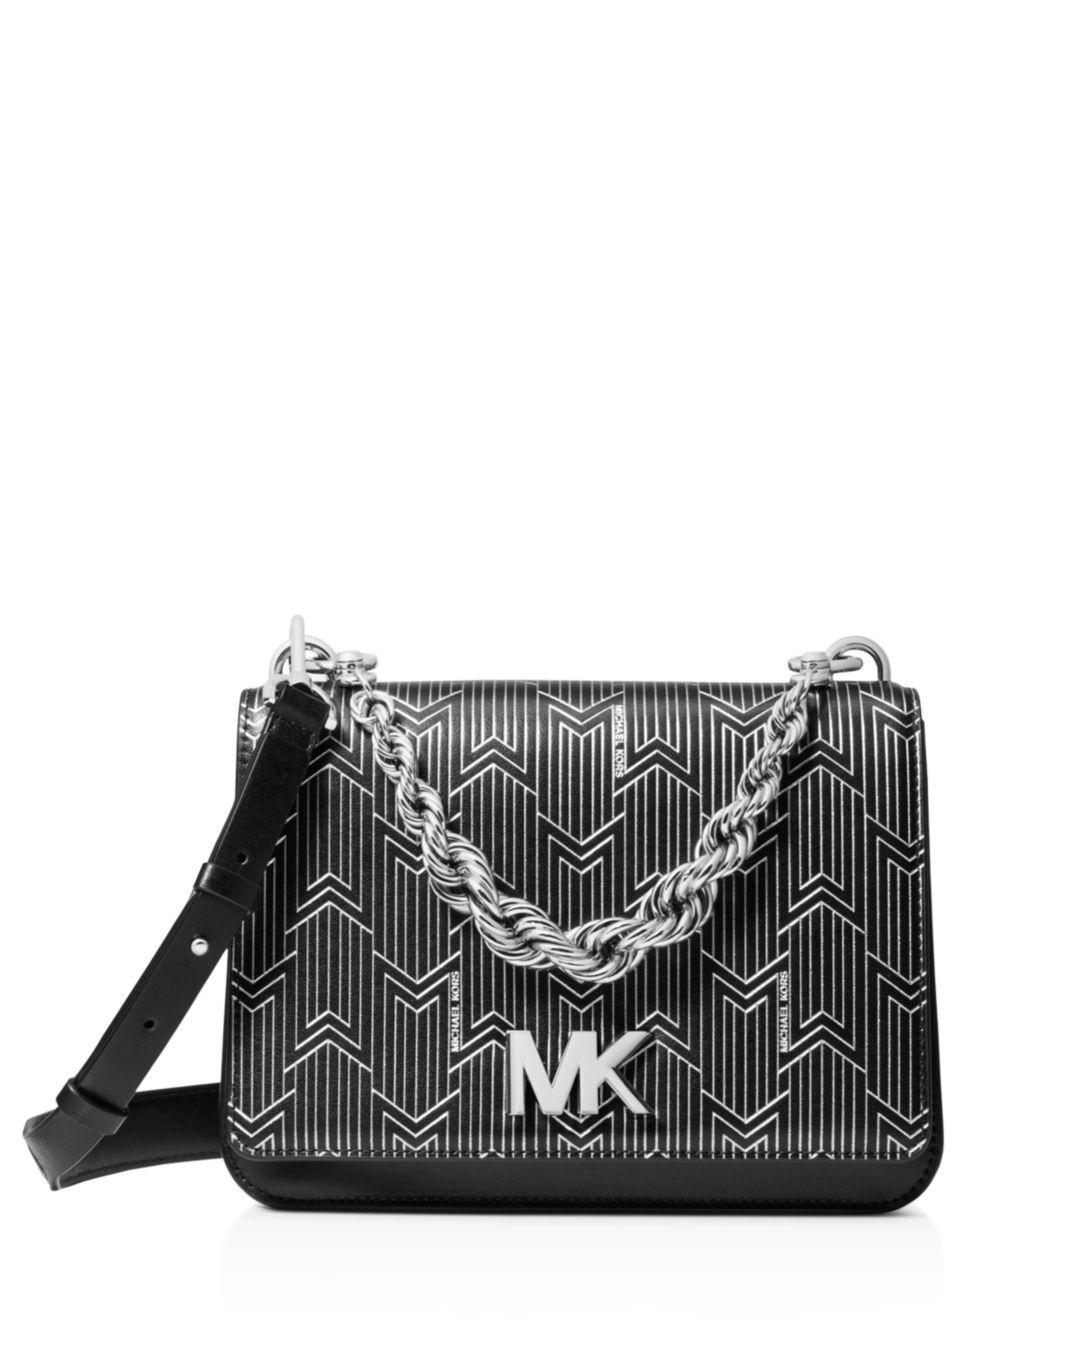 a32279647ee3 MICHAEL Michael Kors. Women s Metallic Matt Chain Leather Shoulder Bag